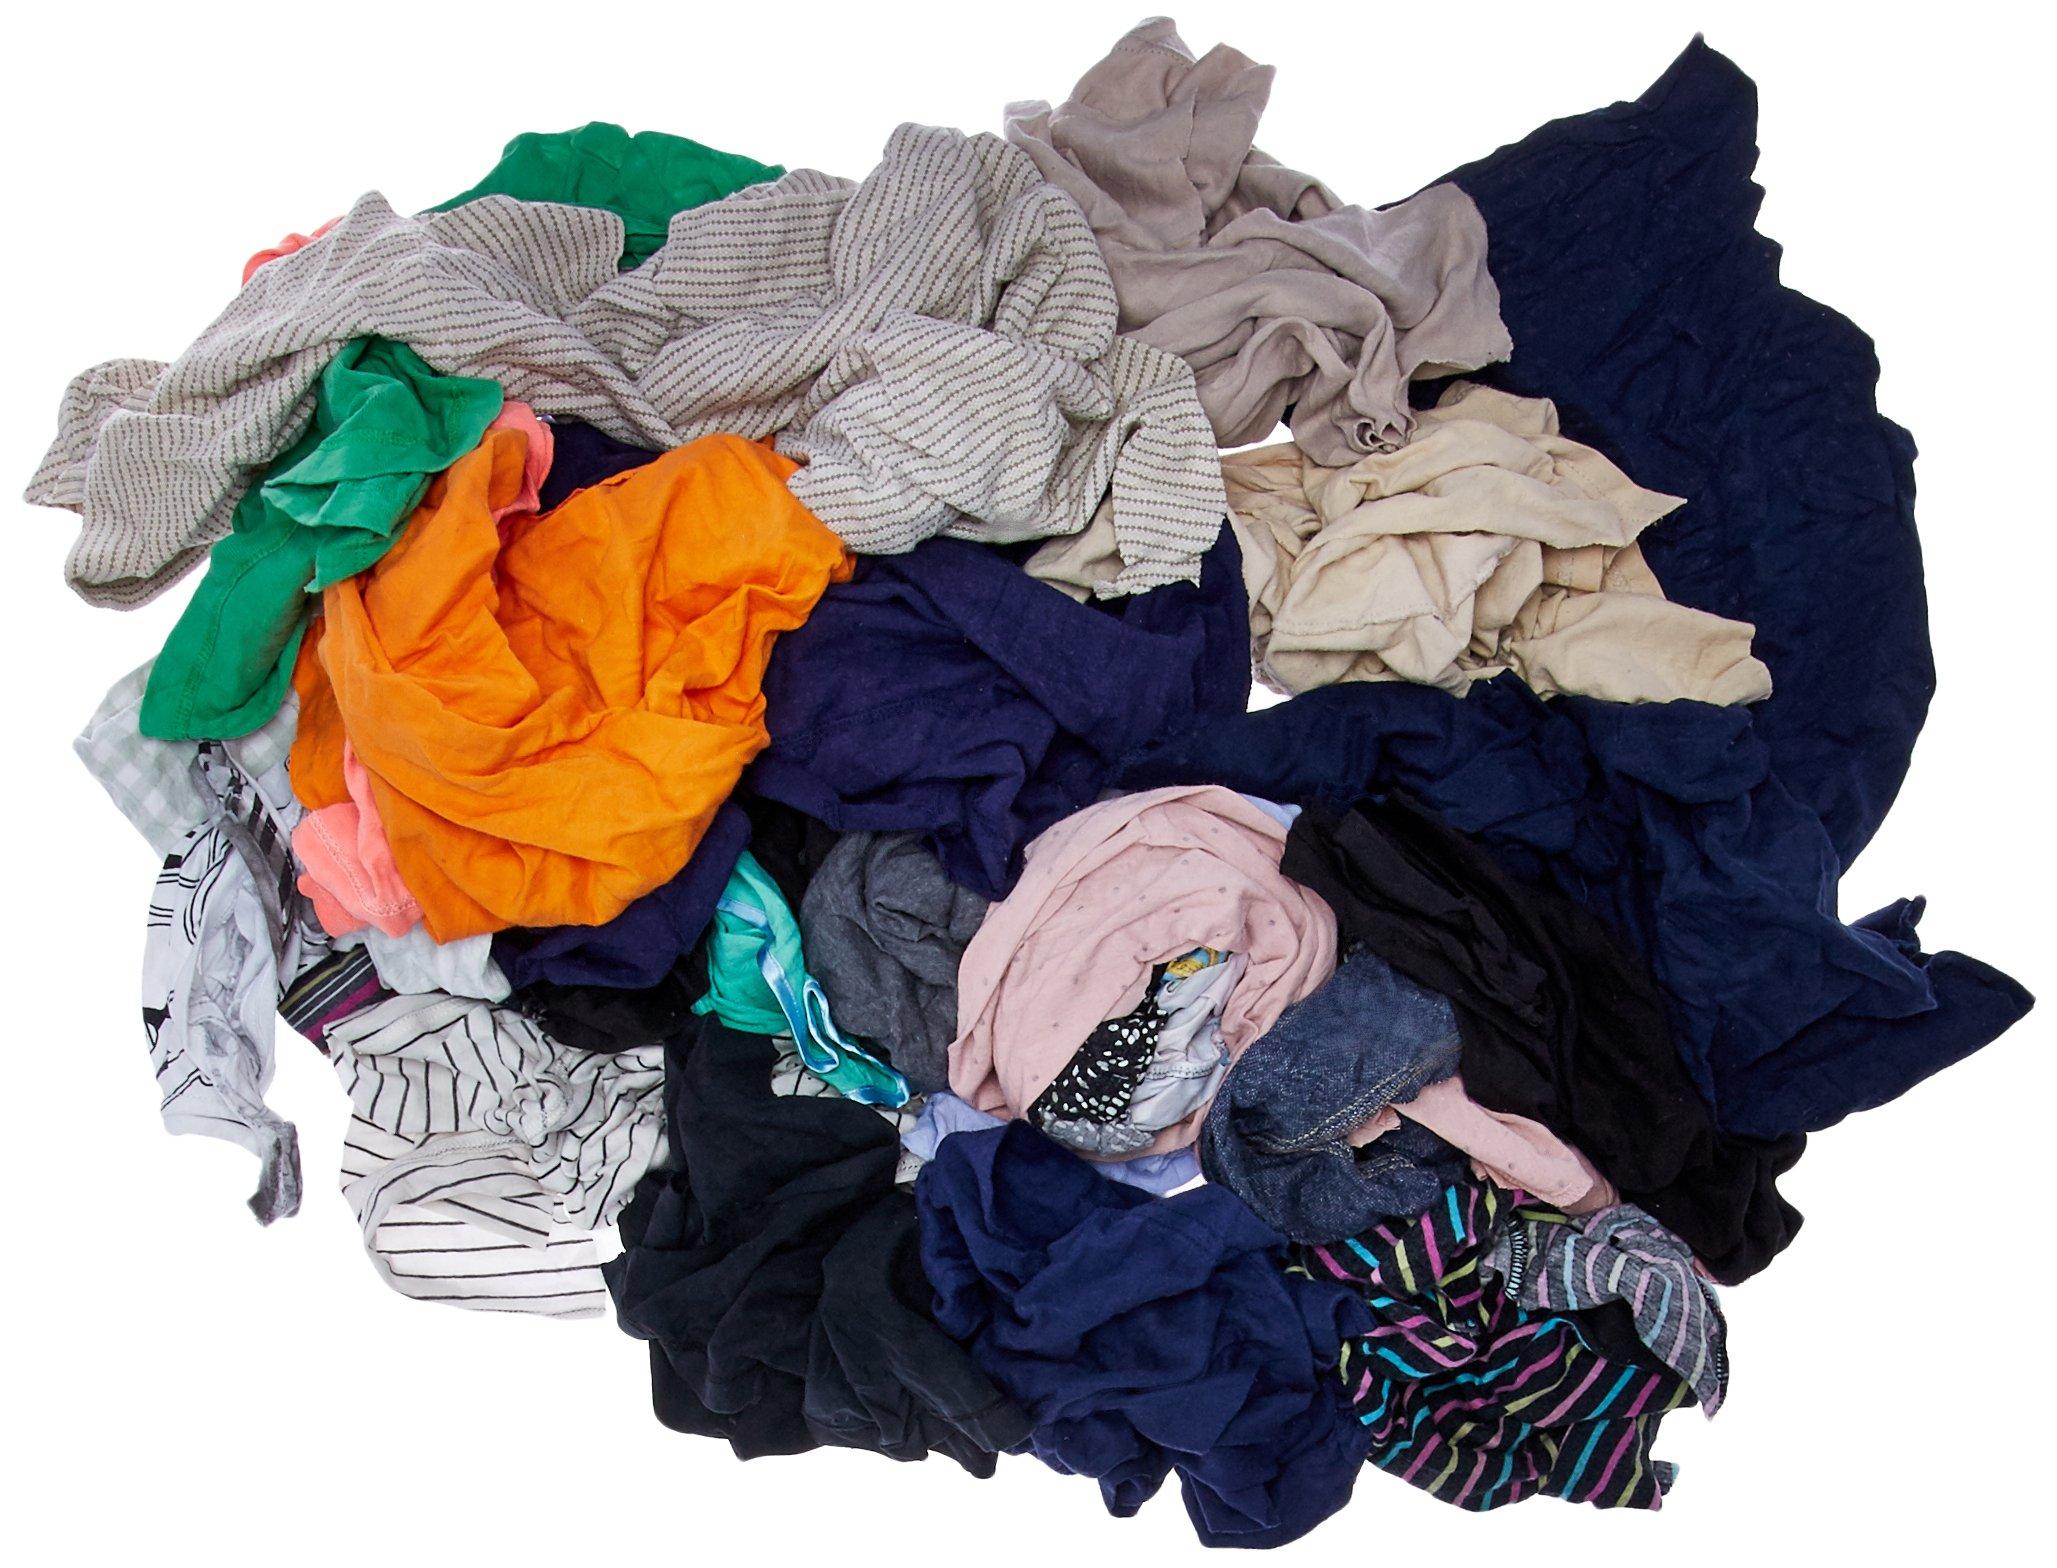 Buffalo Industries (10084PB) Recycled Multicolored T-Shirt Cloth Rags - 25 lb. bag